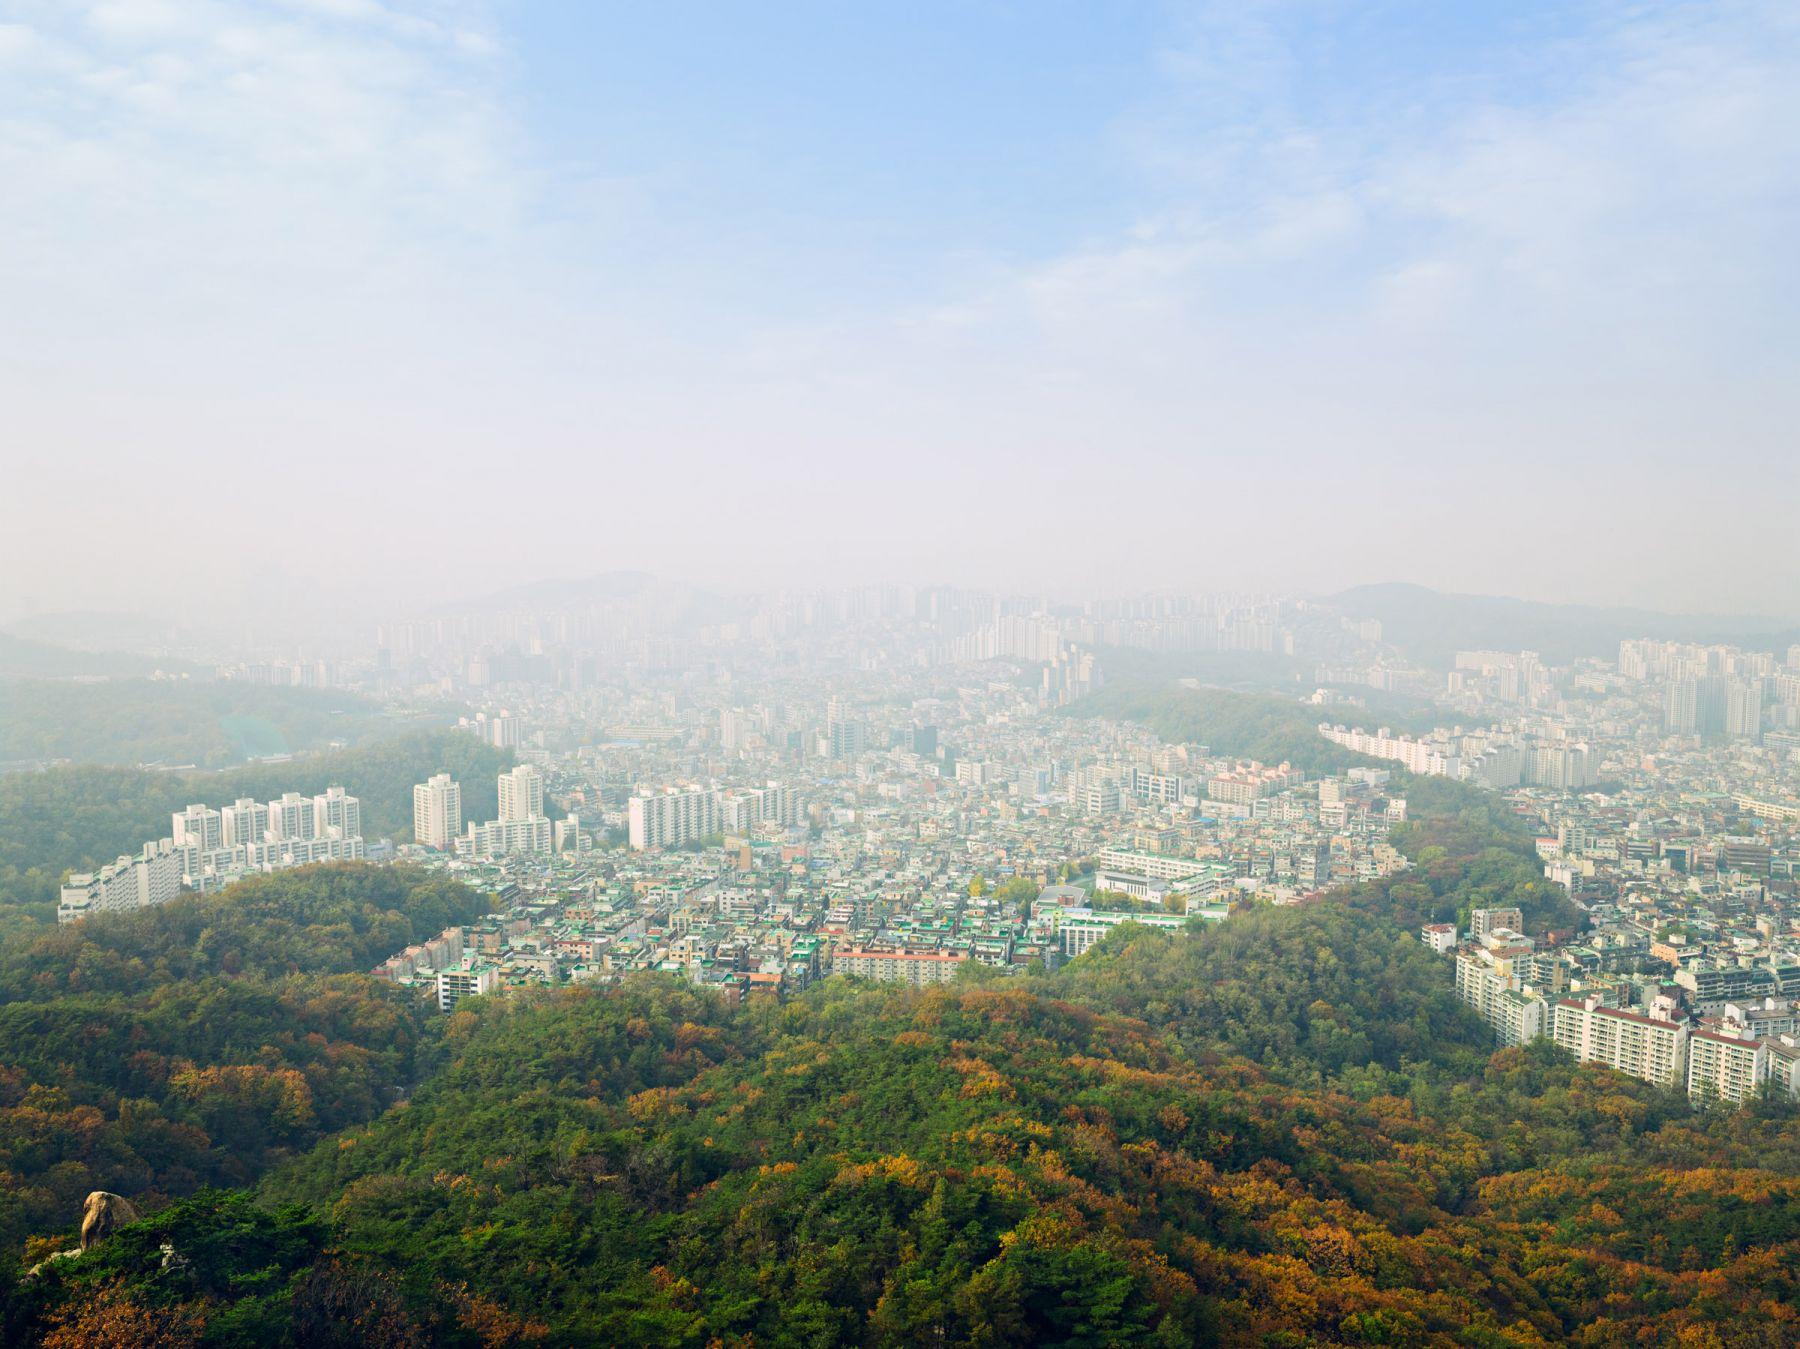 LUCAS FOGLIAUrban Greenway in Seoul, South Korea, 2014, Pigment Print34 x 44 inchesEdition of 8